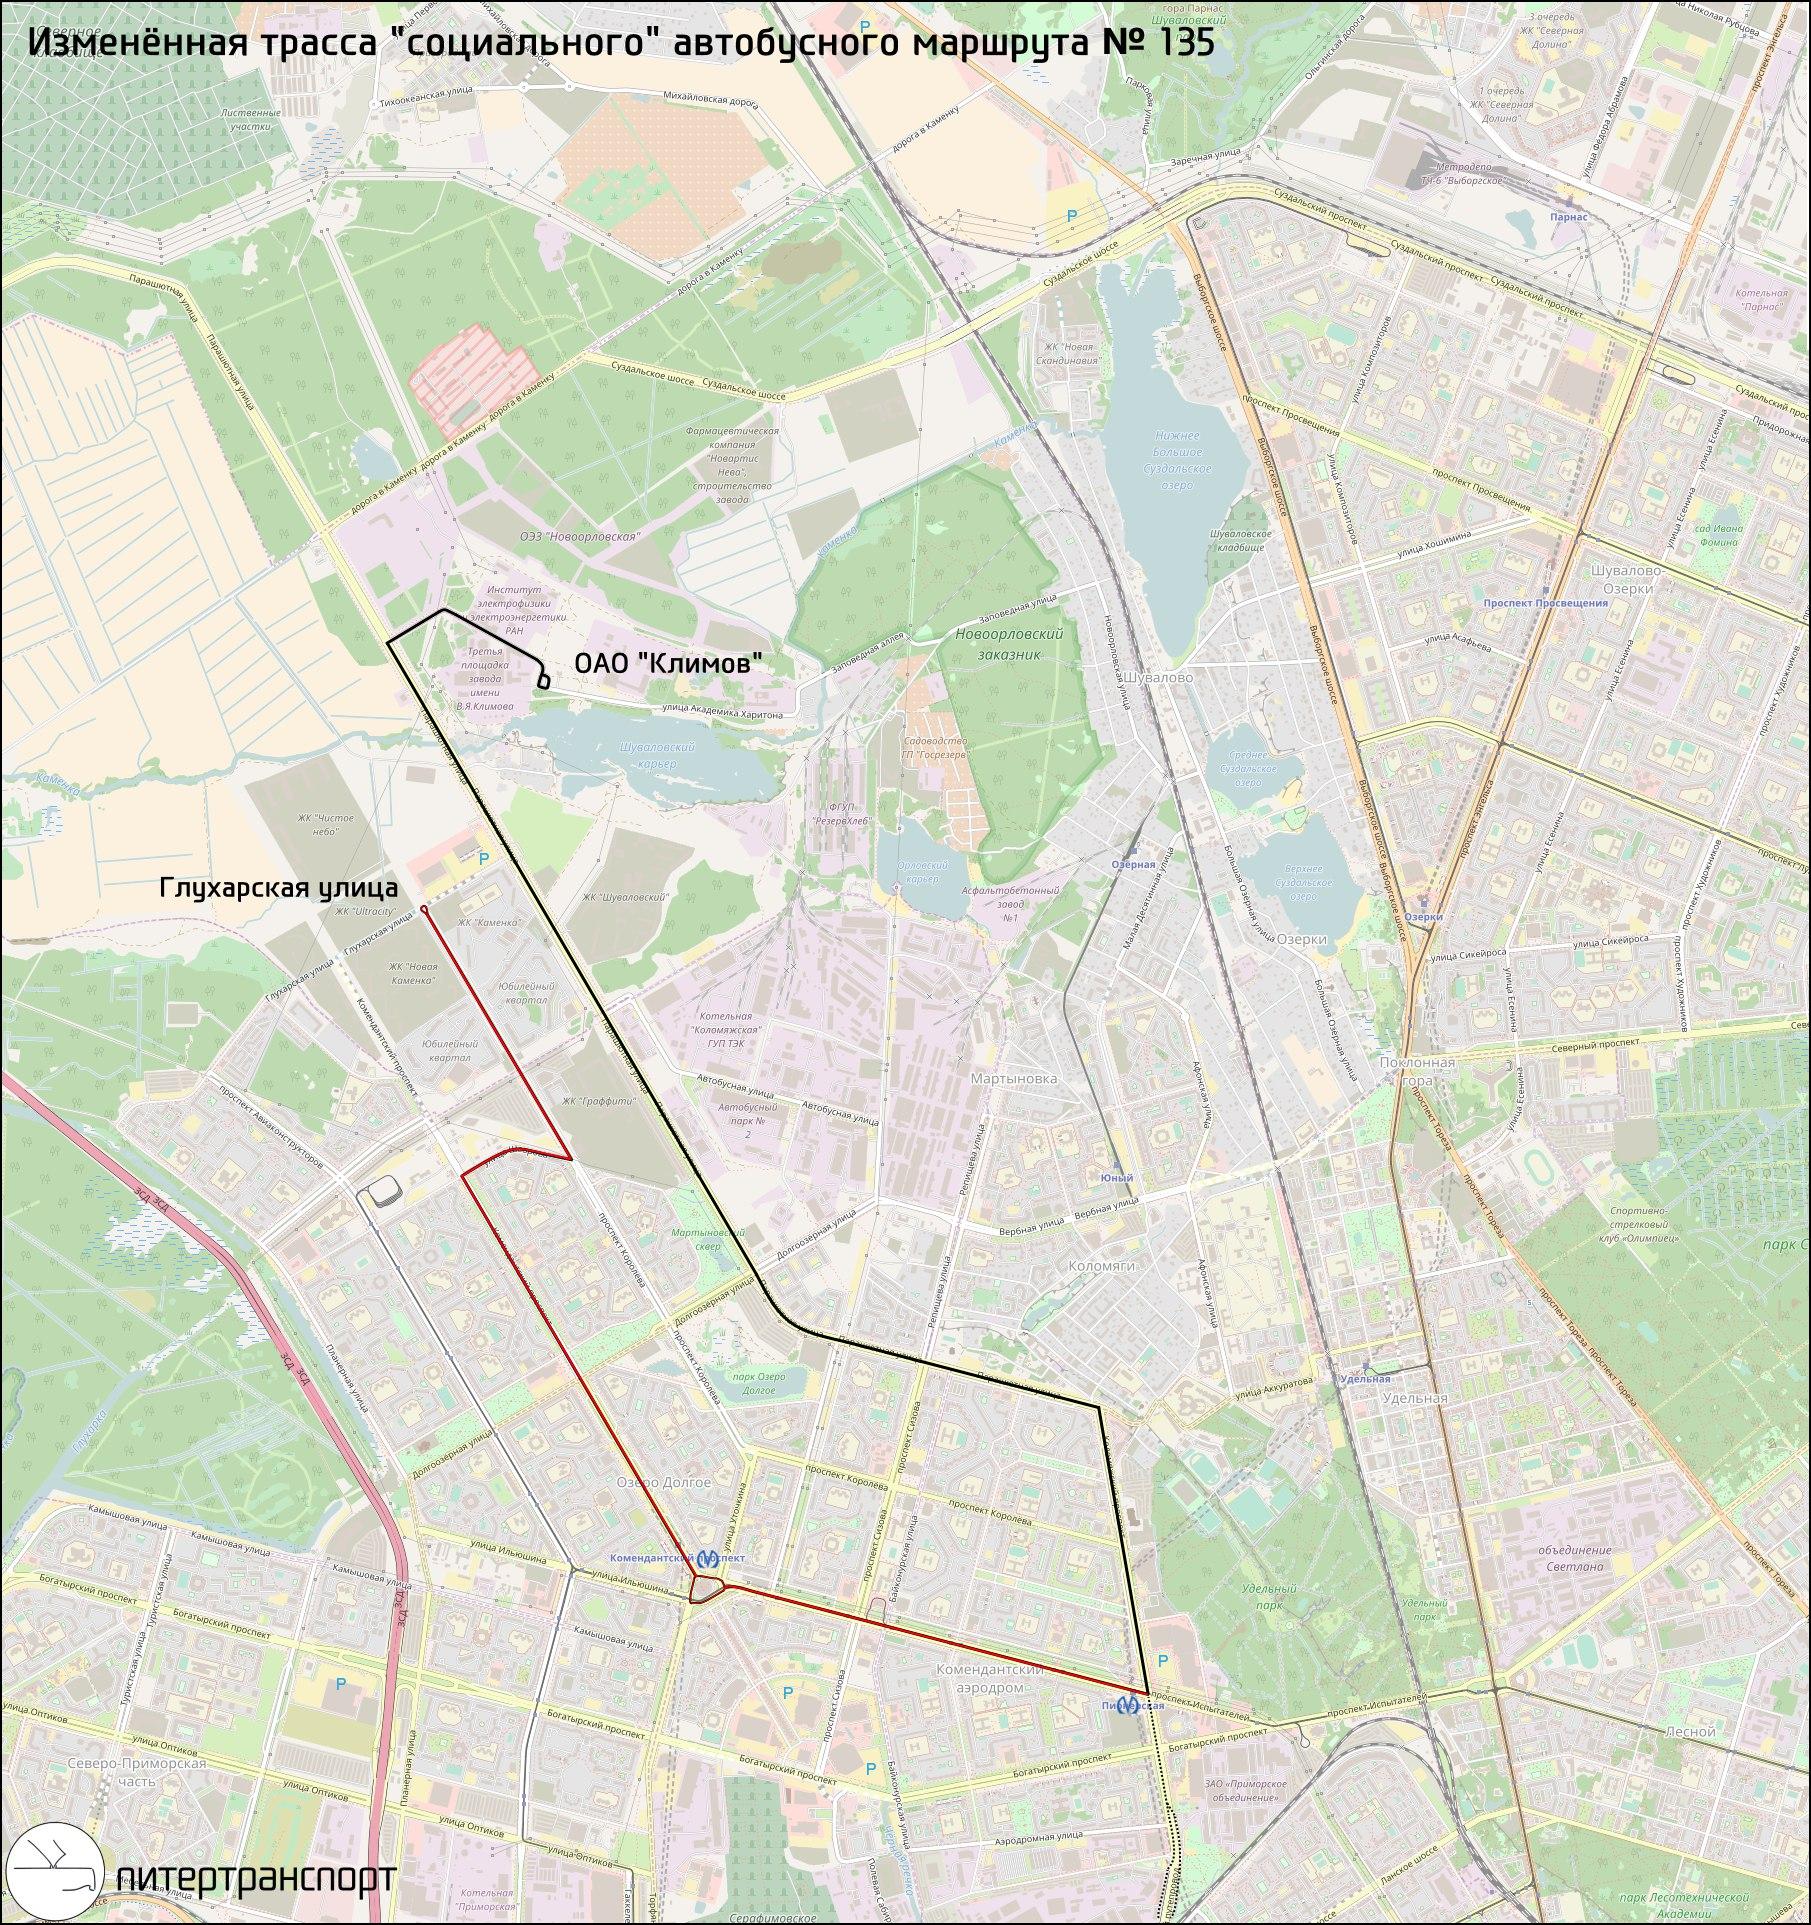 Новая трасса автобусного маршрута №135